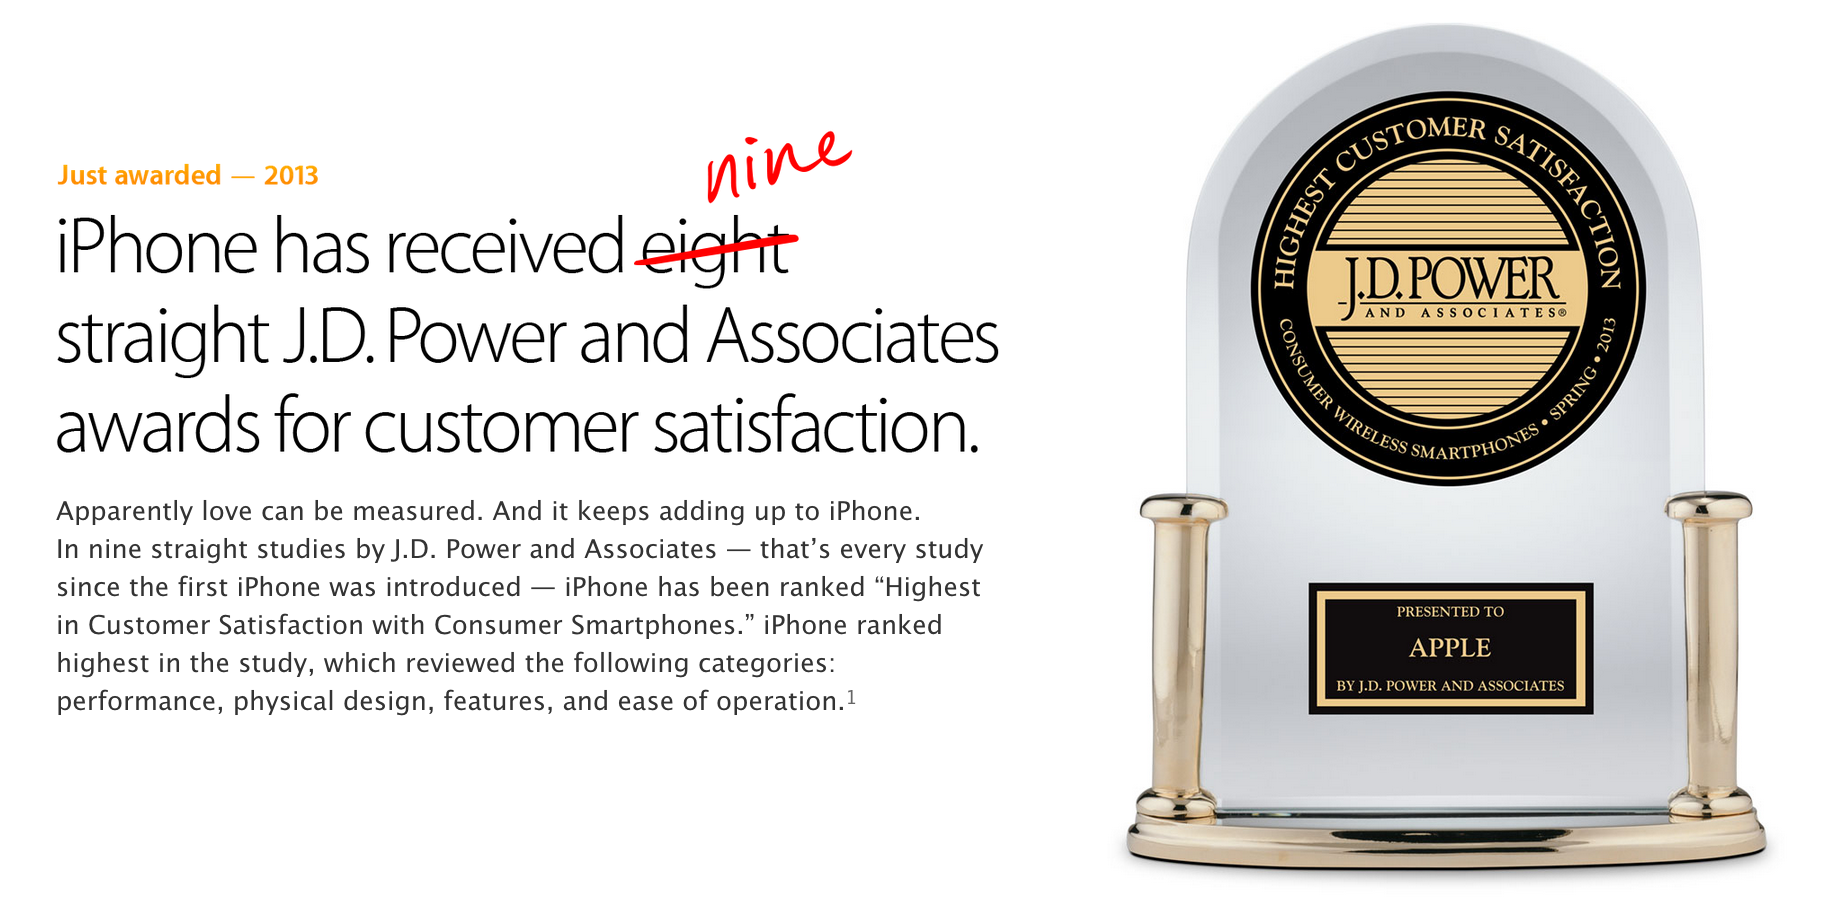 iphone-jd-power-associates-award-9